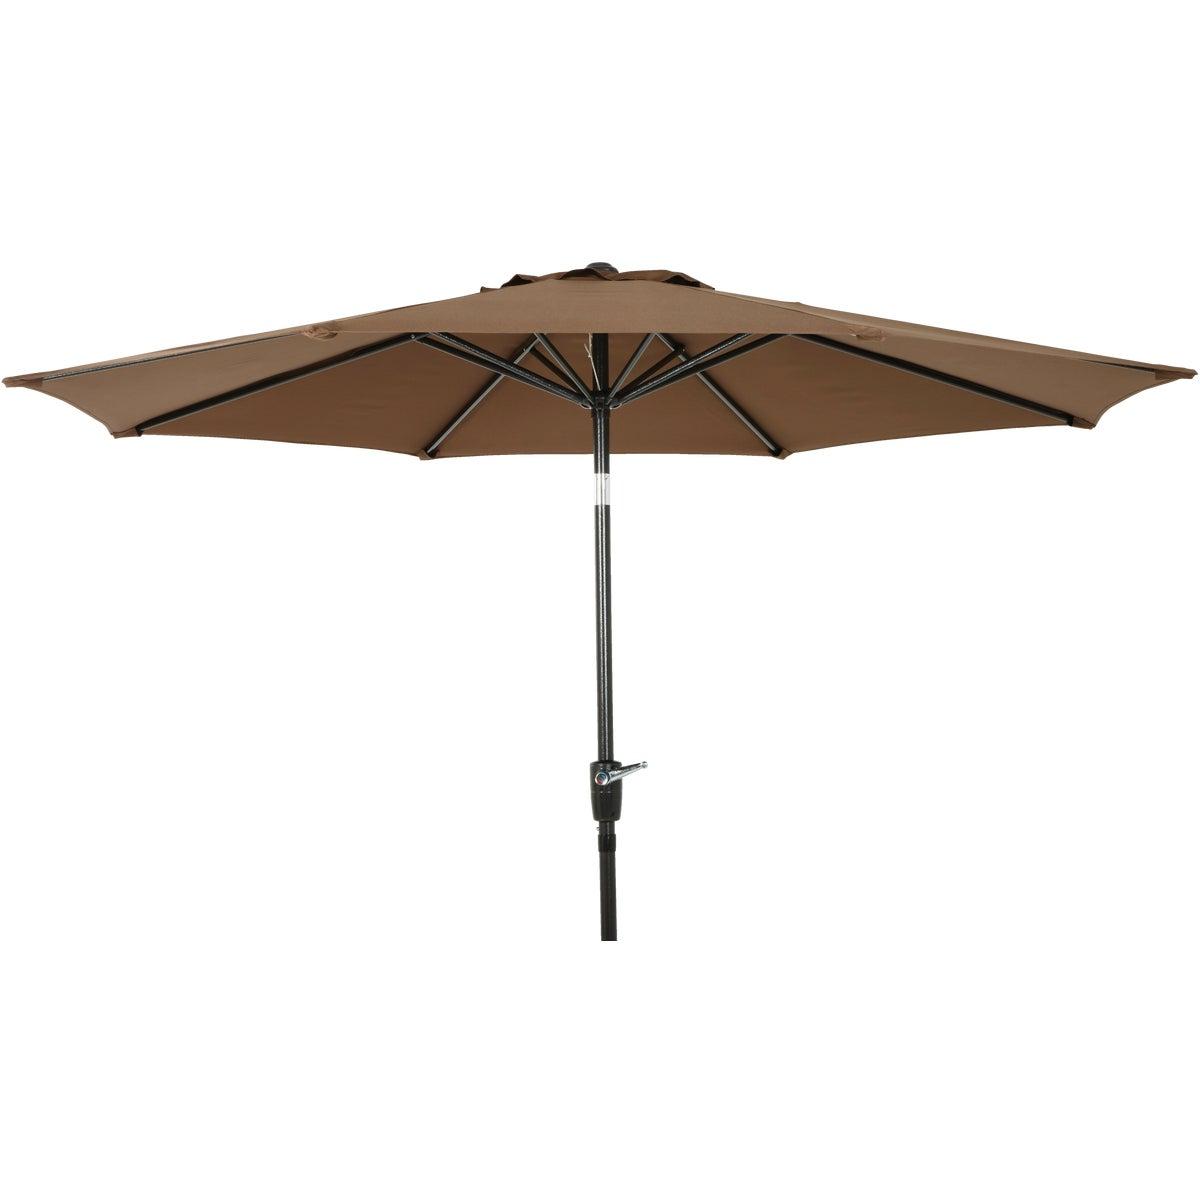 https www doitbest com shop outdoor living patio furniture patio umbrellas and bases patio umbrella outdoor expressions 9 ft aluminum tiltcrank brown patio umbrella sku 821891